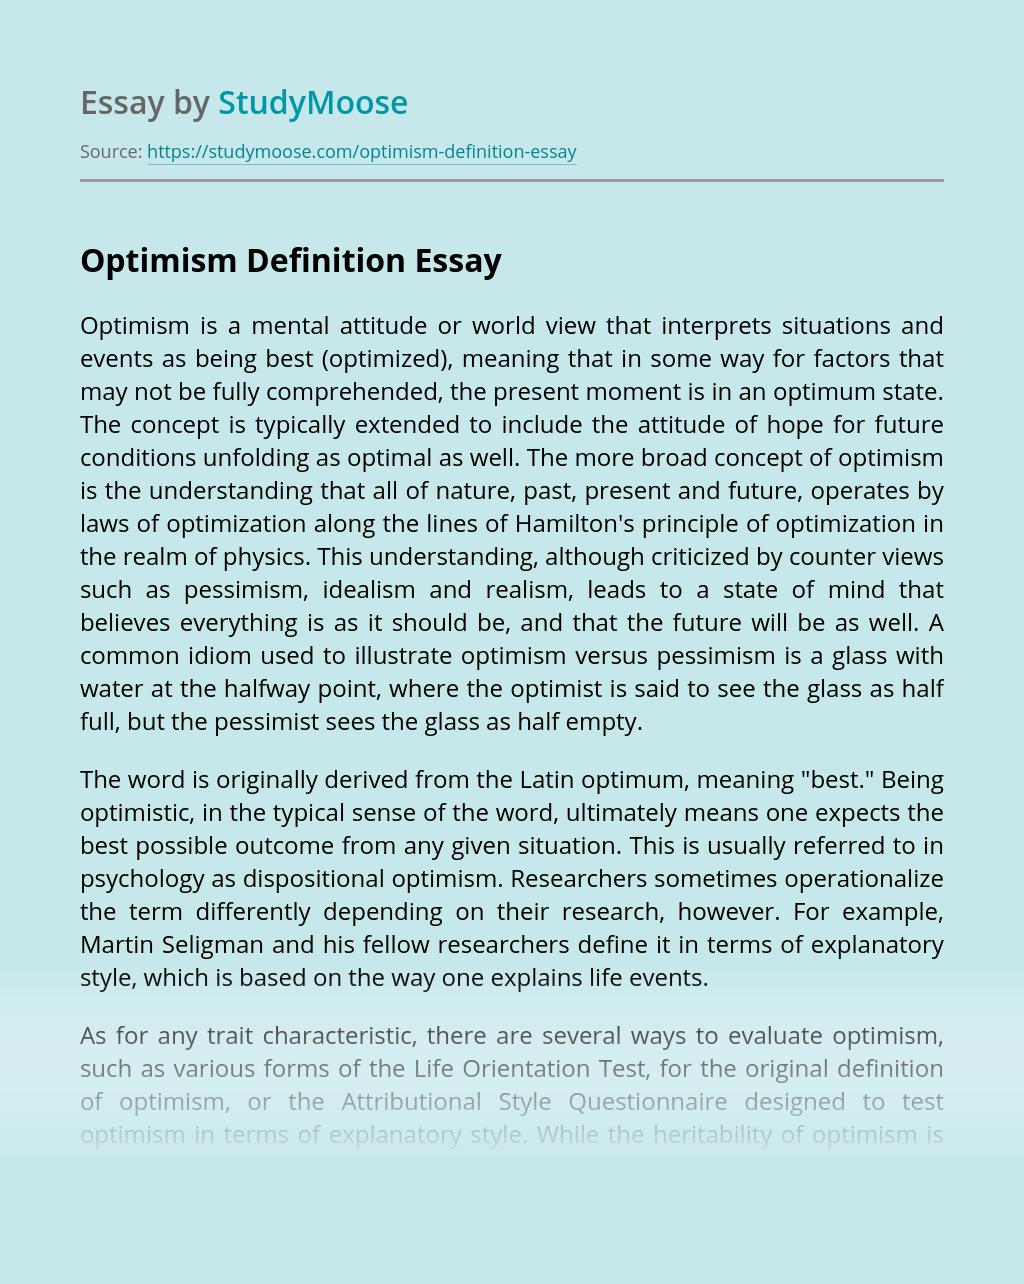 Optimism Definition